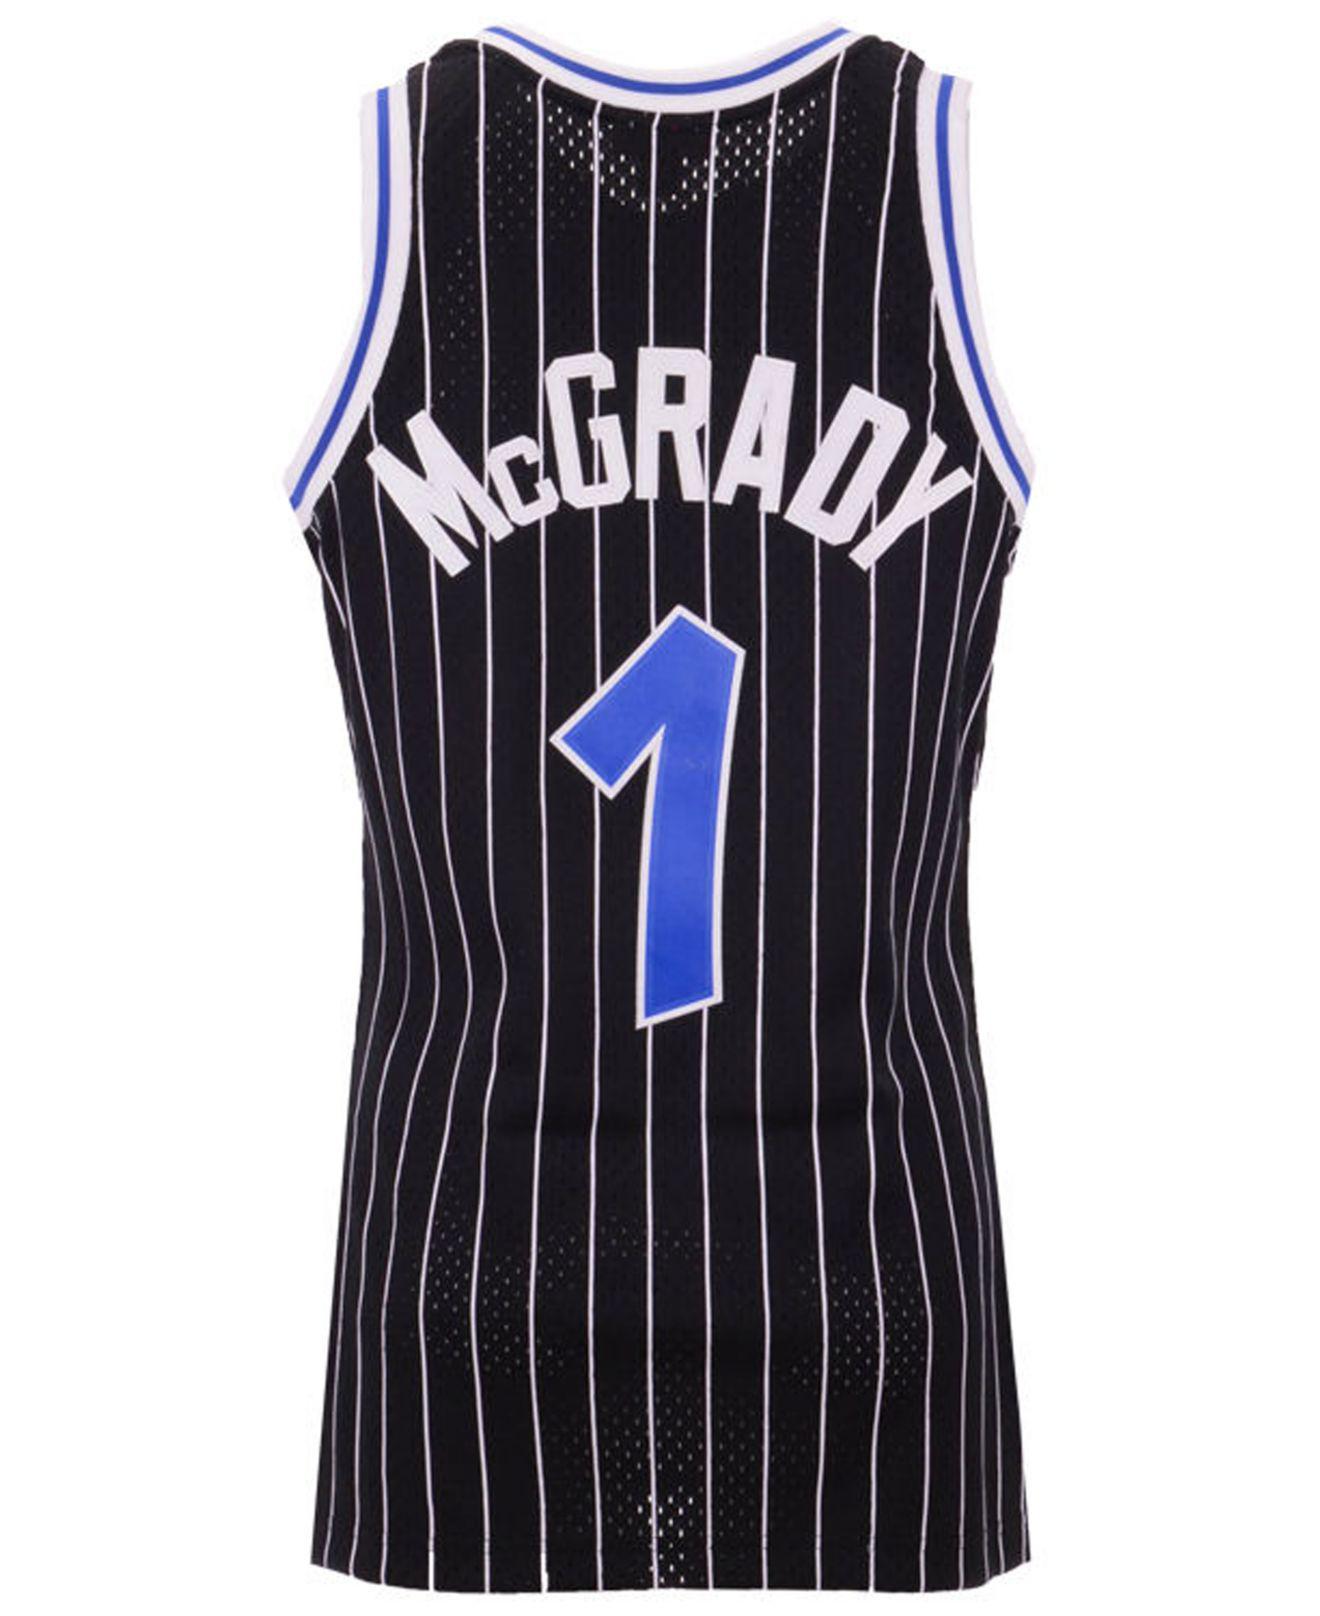 c9f5859874c Mitchell   Ness. Men s Black Tracy Mcgrady Orlando Magic Hardwood Classic  Swingman Jersey